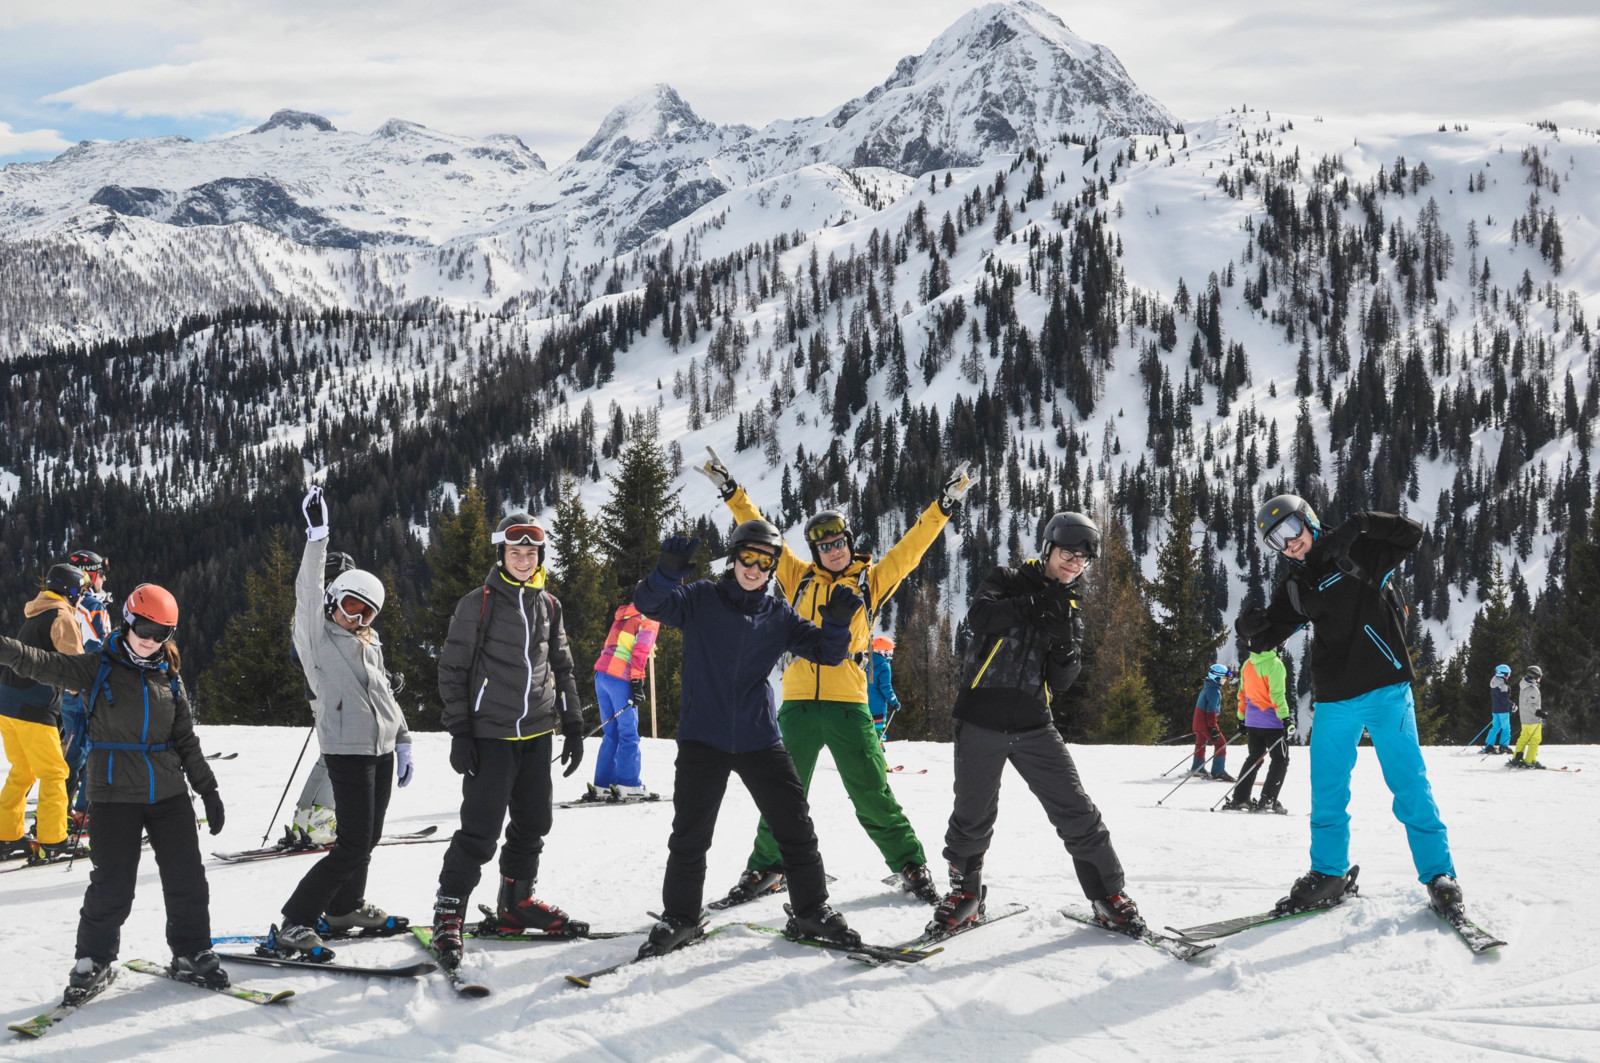 [2022] Ski Amadé - skigebied vlakbij (snowboarden) - Krokus - Kleinarl